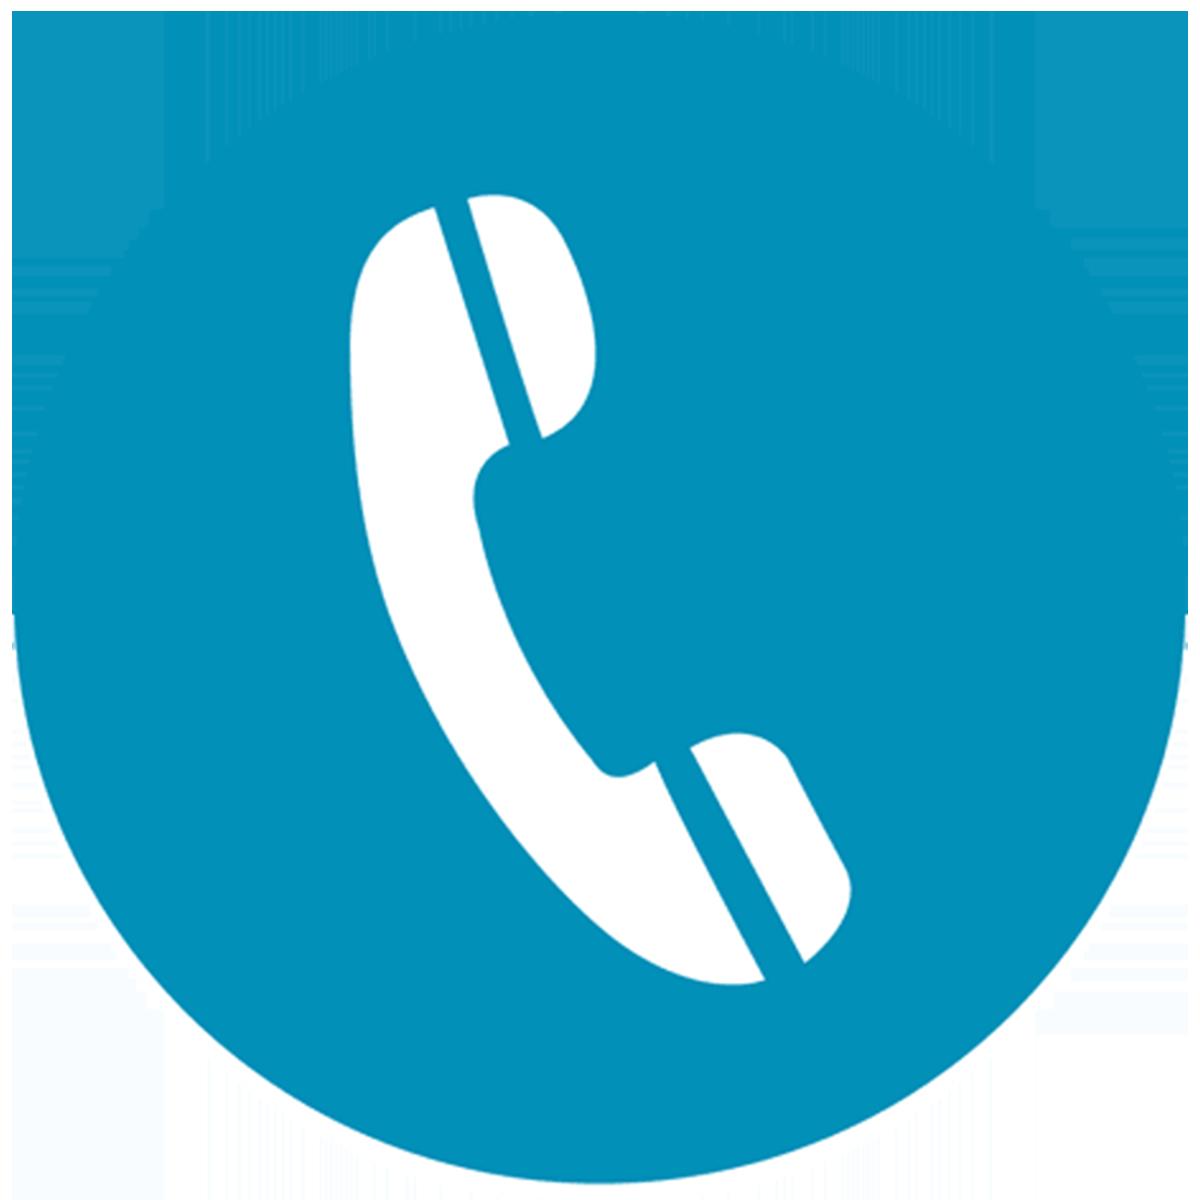 telefono png